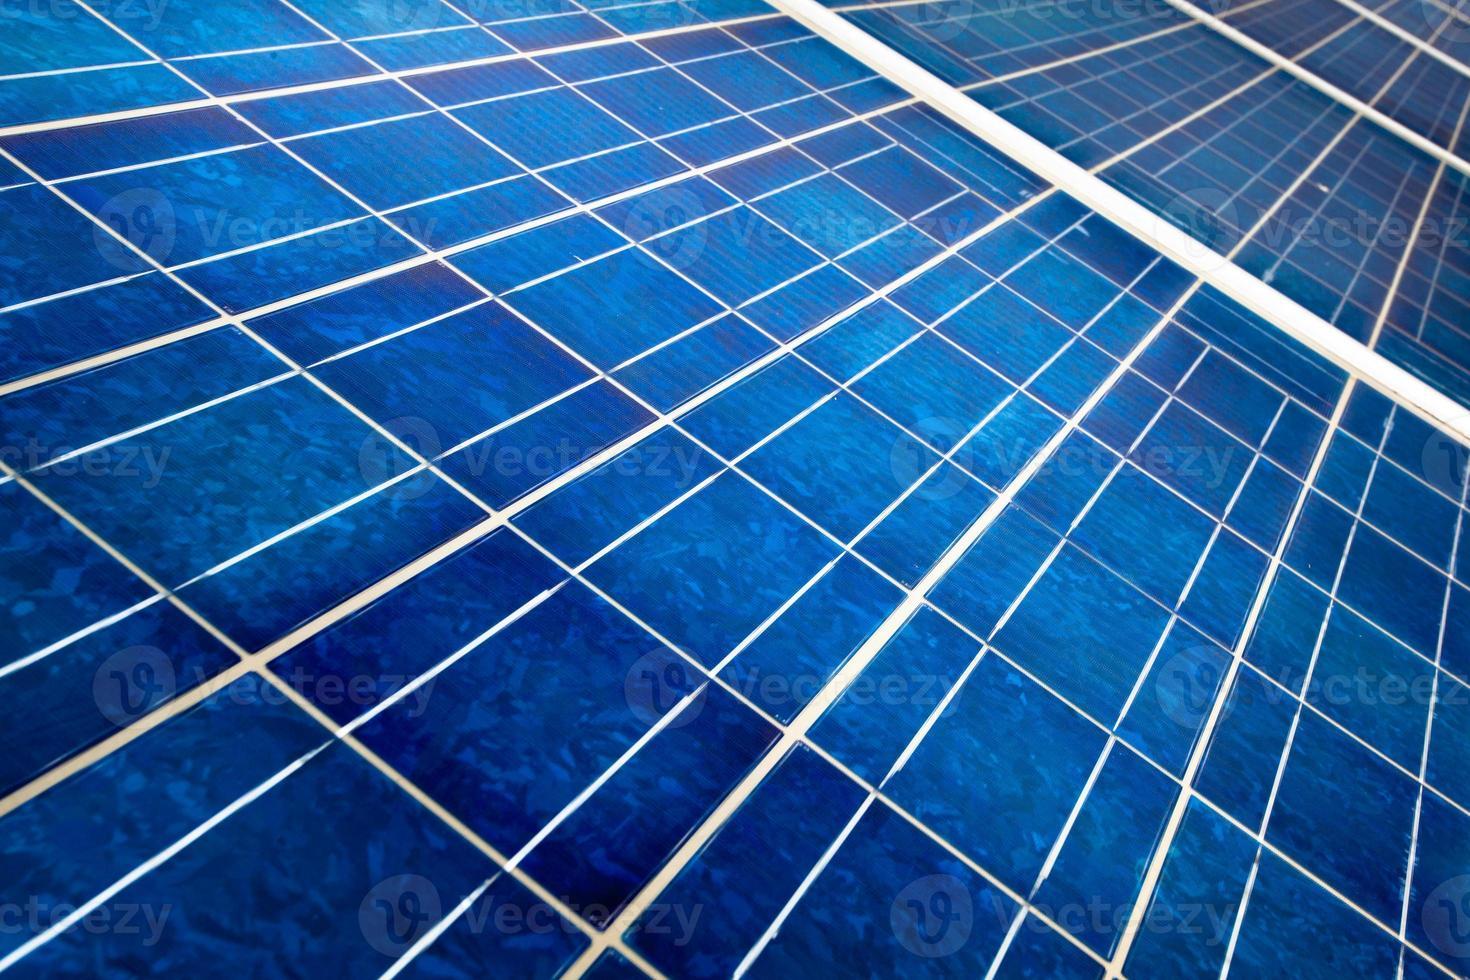 Solar panel close up photo